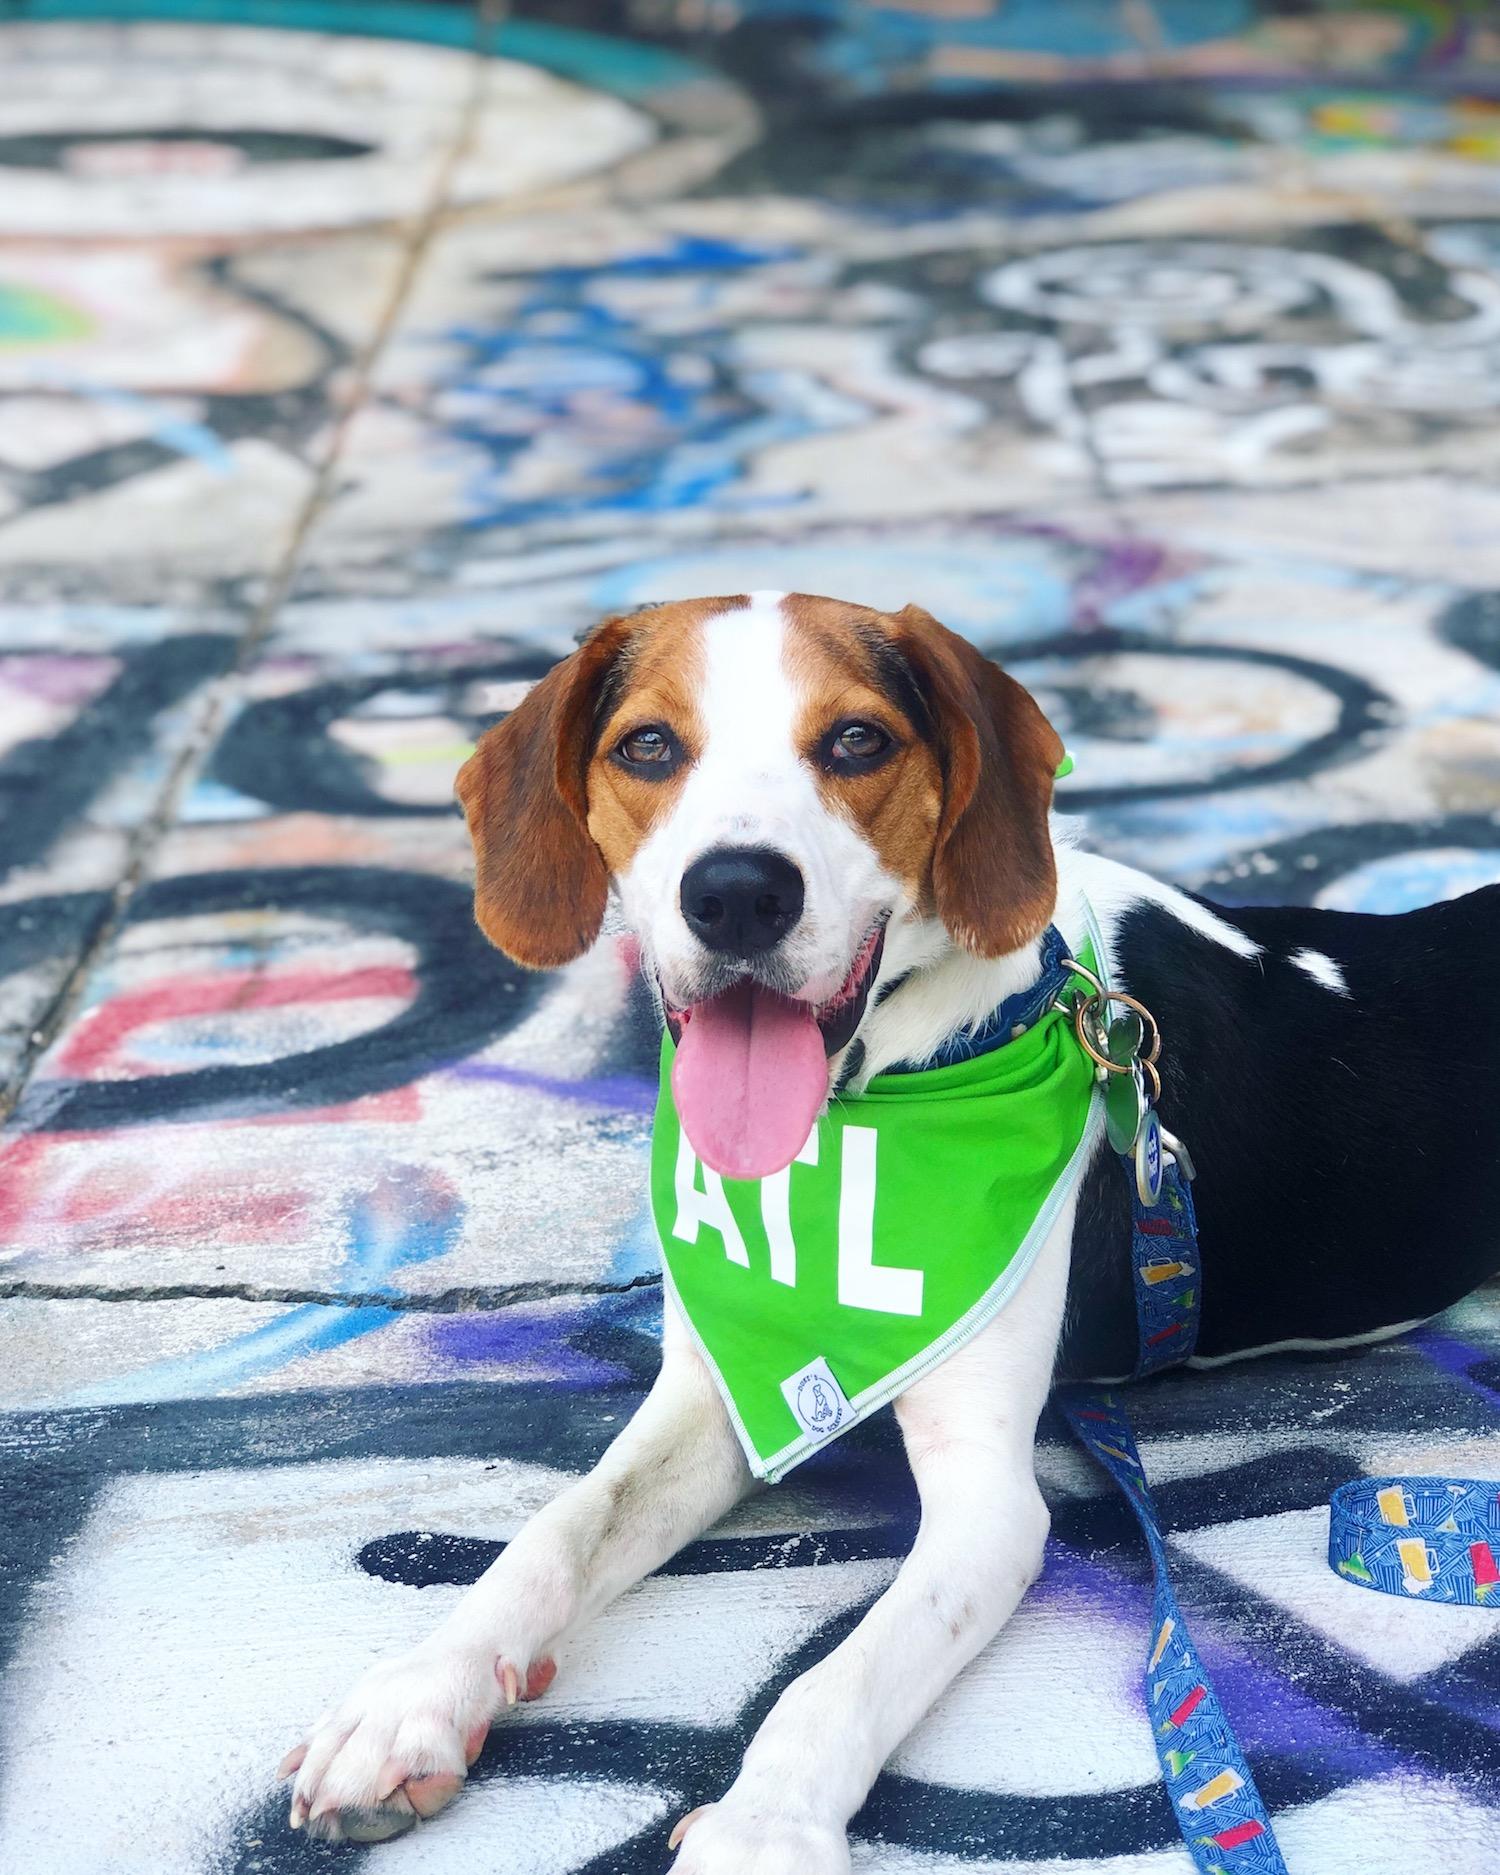 The same beagle pictured above wearing an ATL bandana.